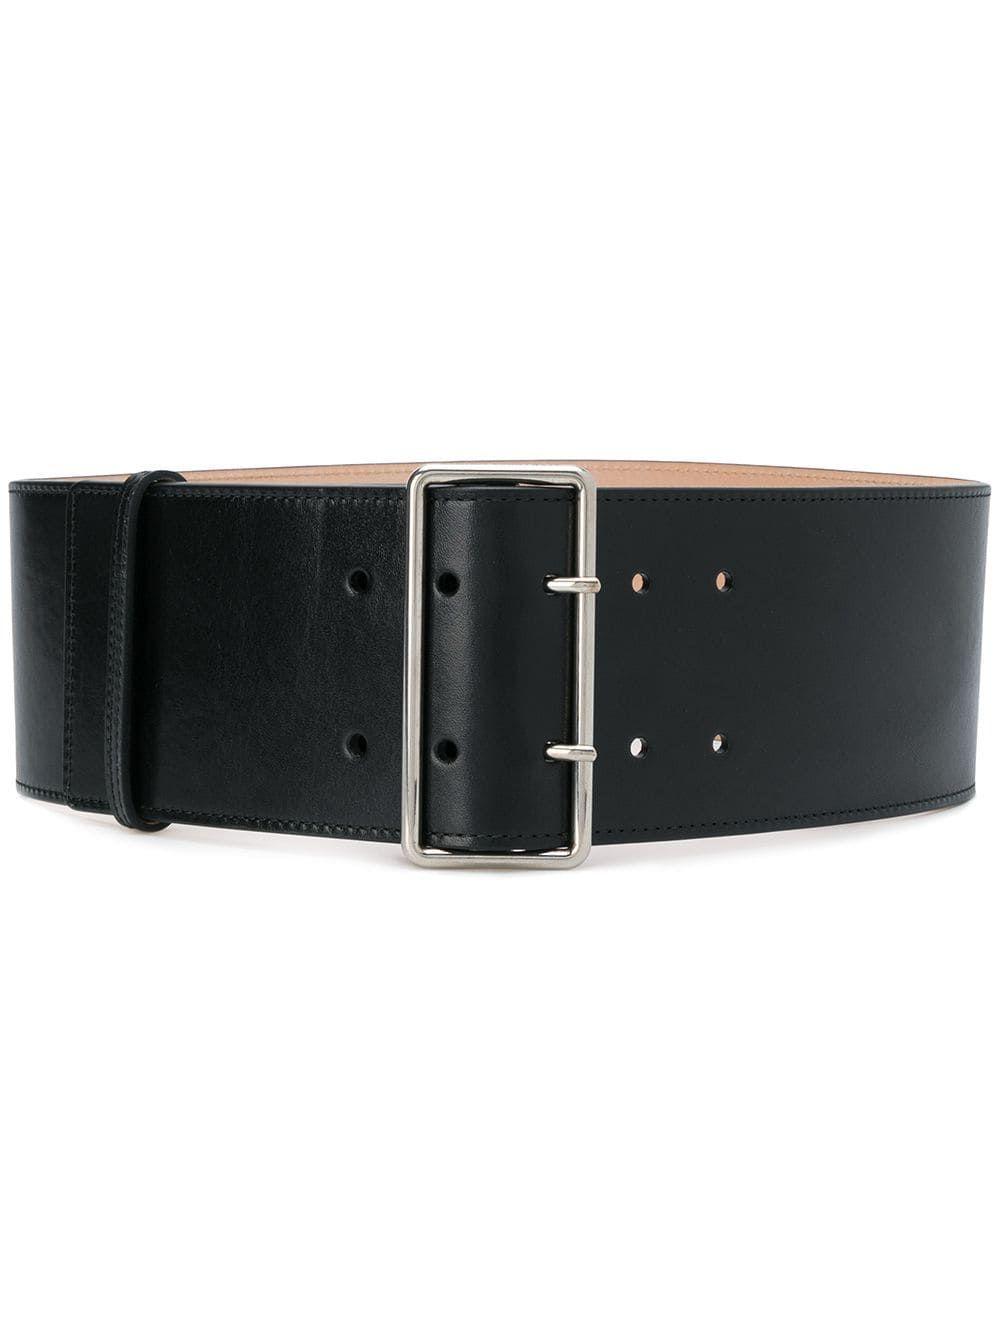 cf23b2d78d Alexander McQueen wide waist belt - Black | Products in 2019 ...